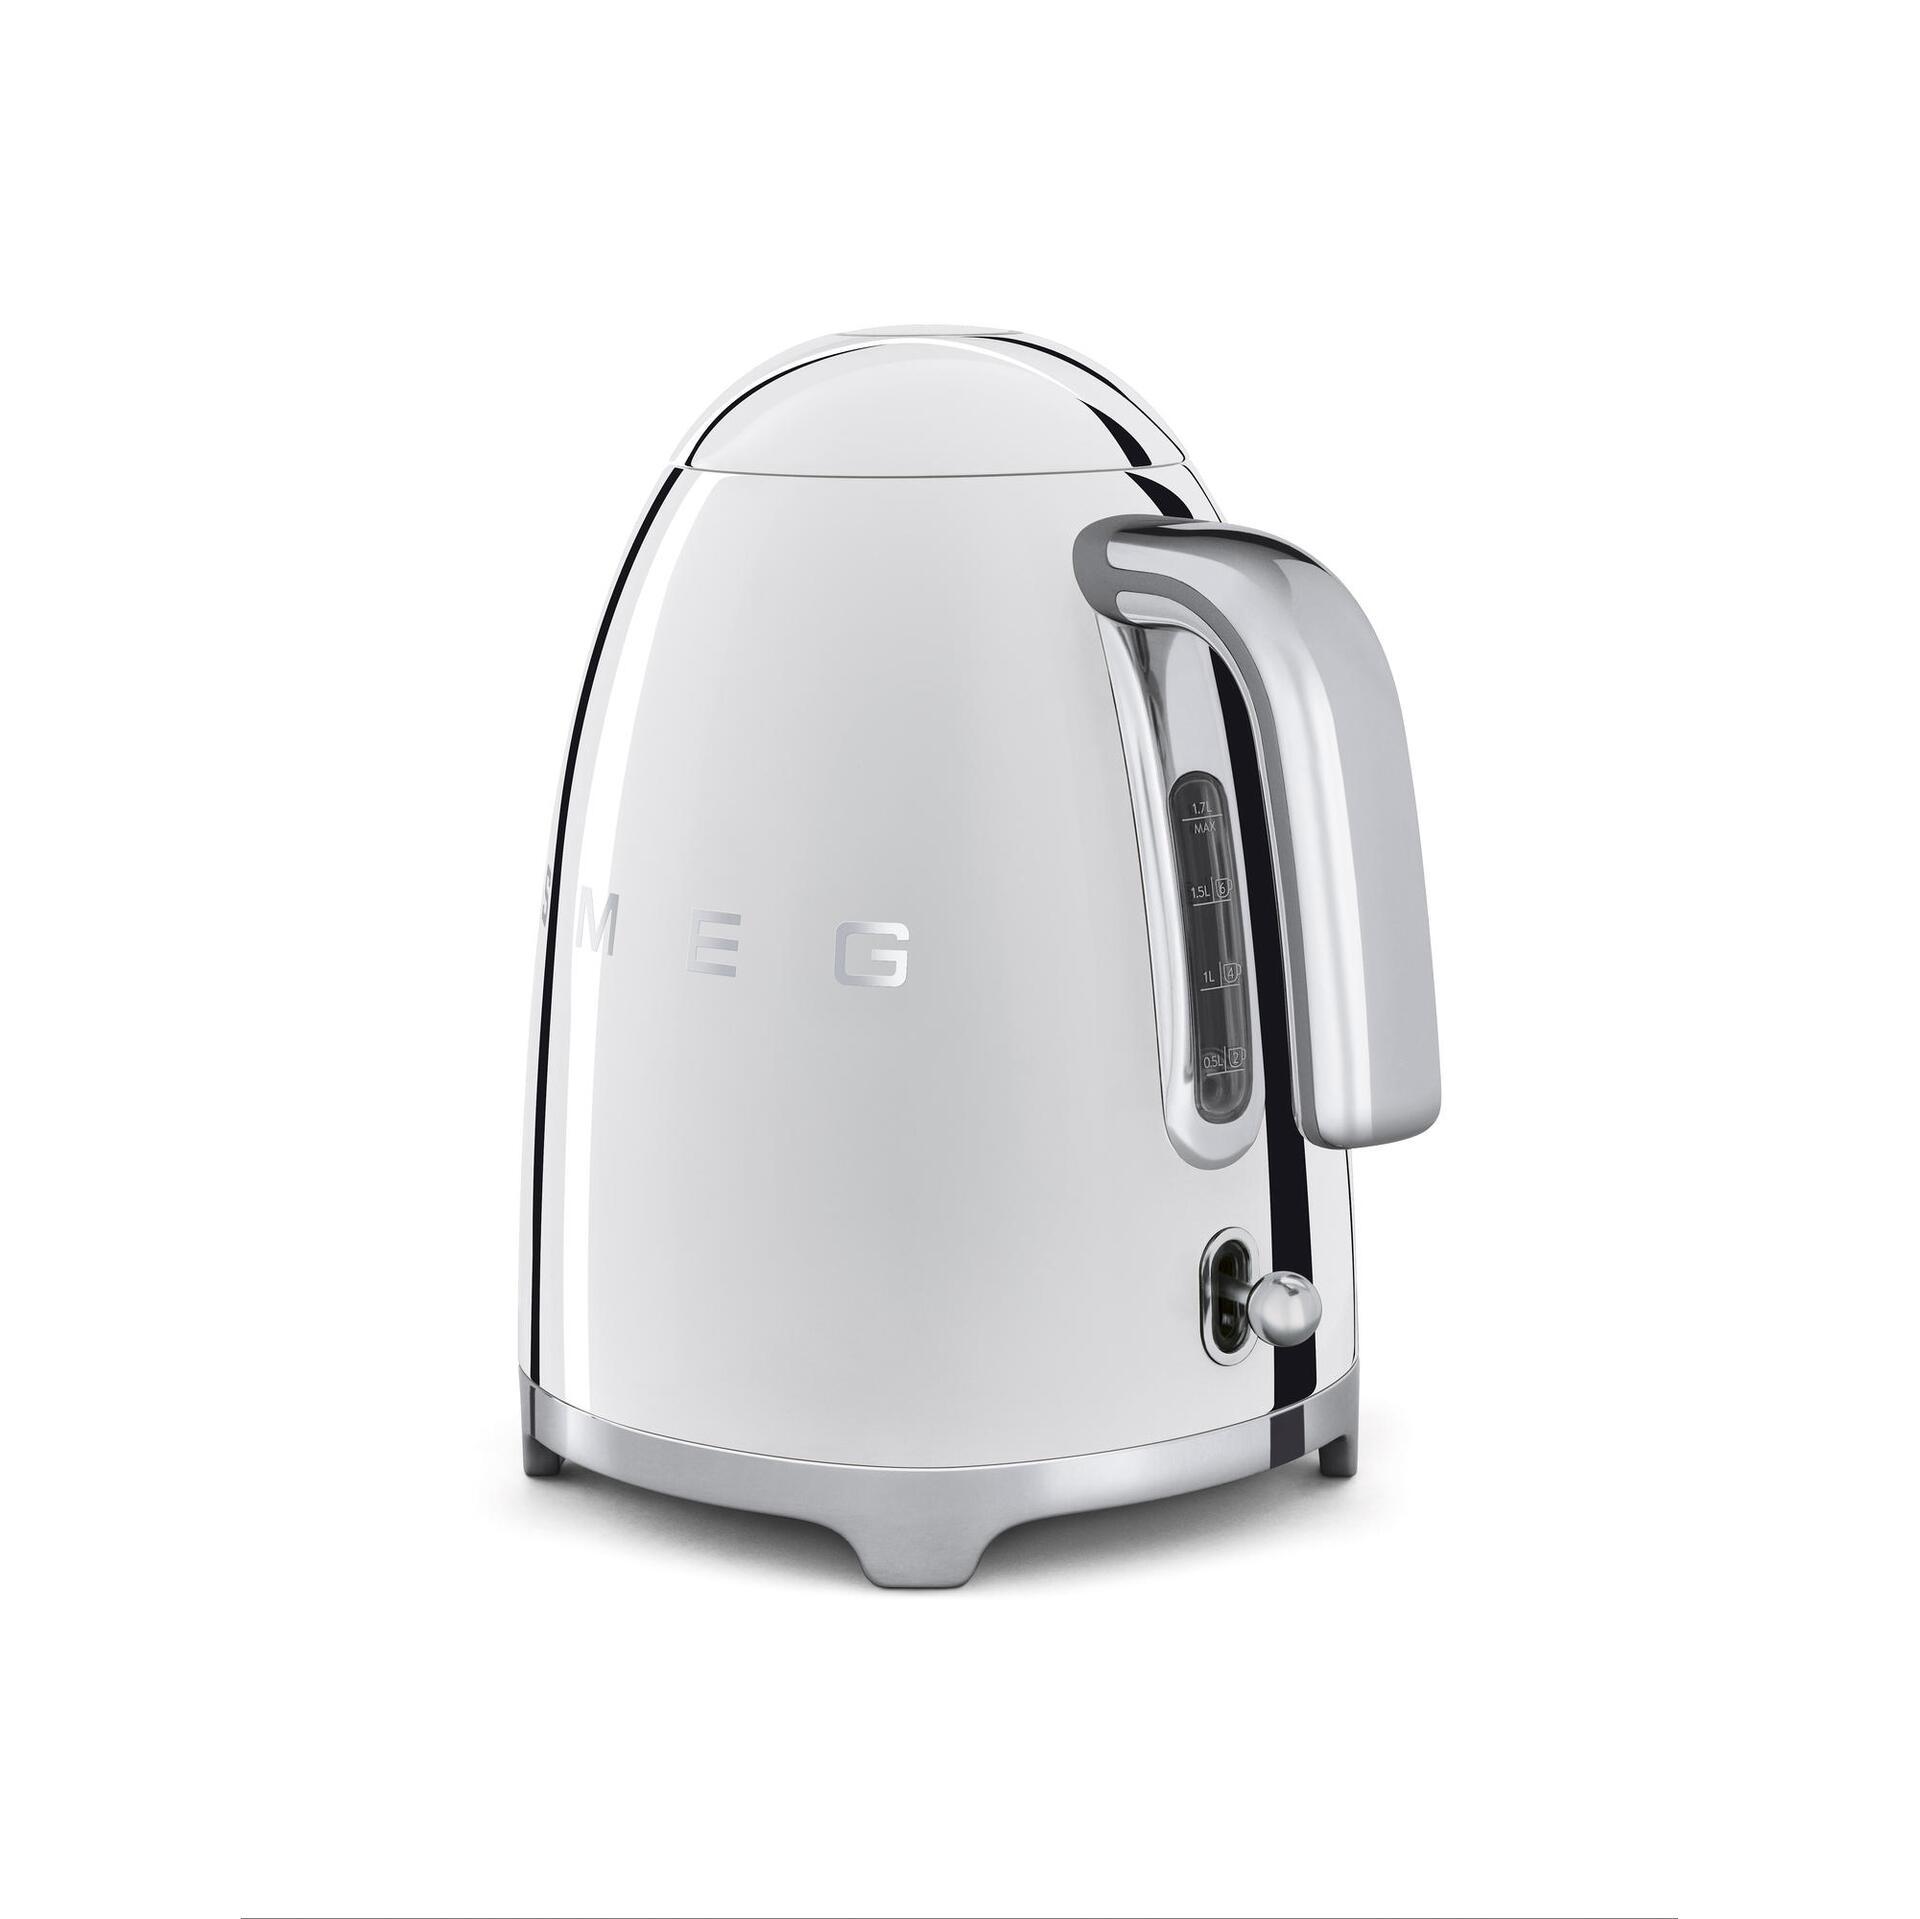 Smeg Retro Wasserkocher 1,7 Liter Chrom